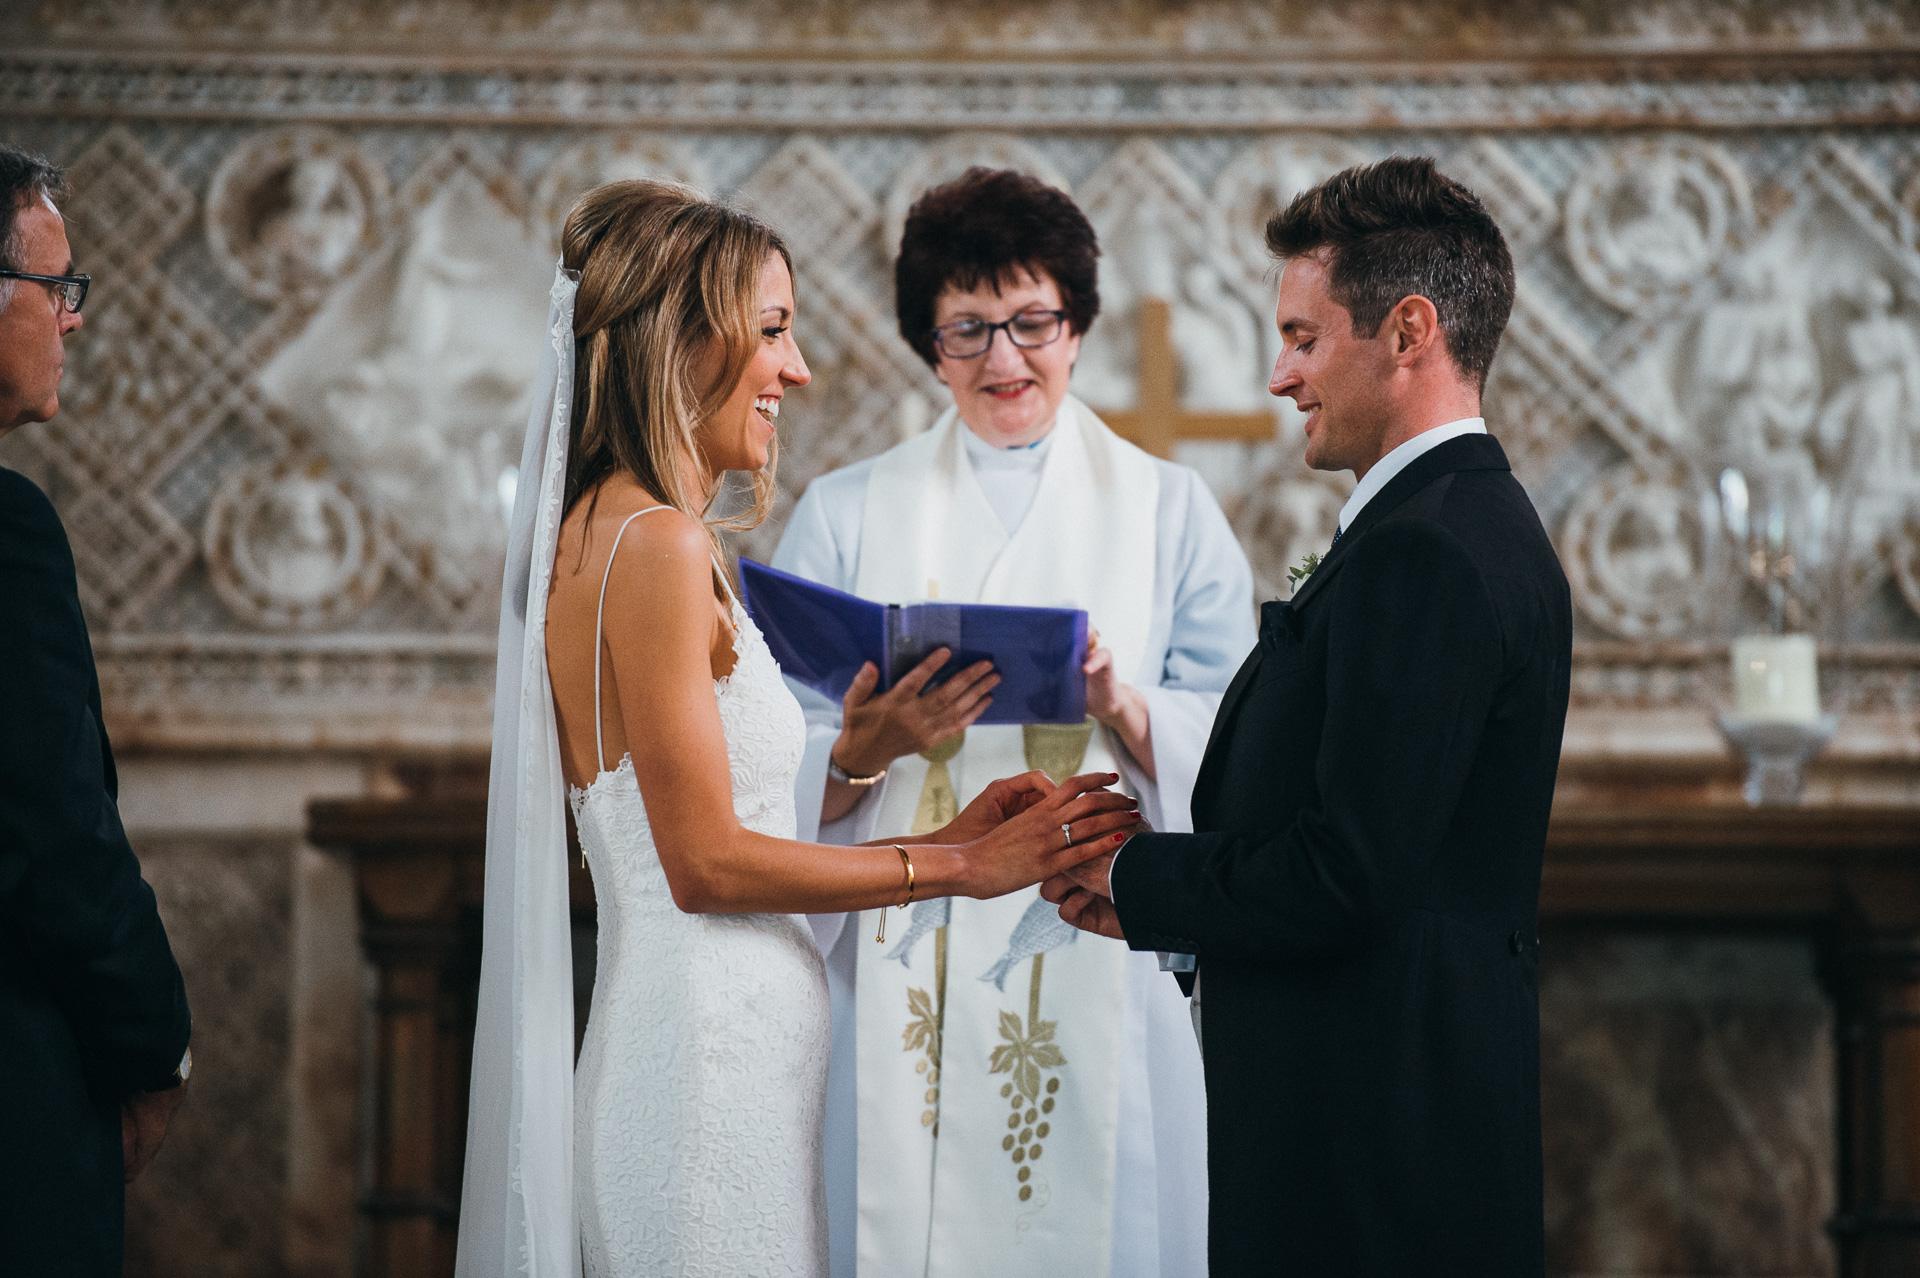 Sudeley castle church wedding photographer